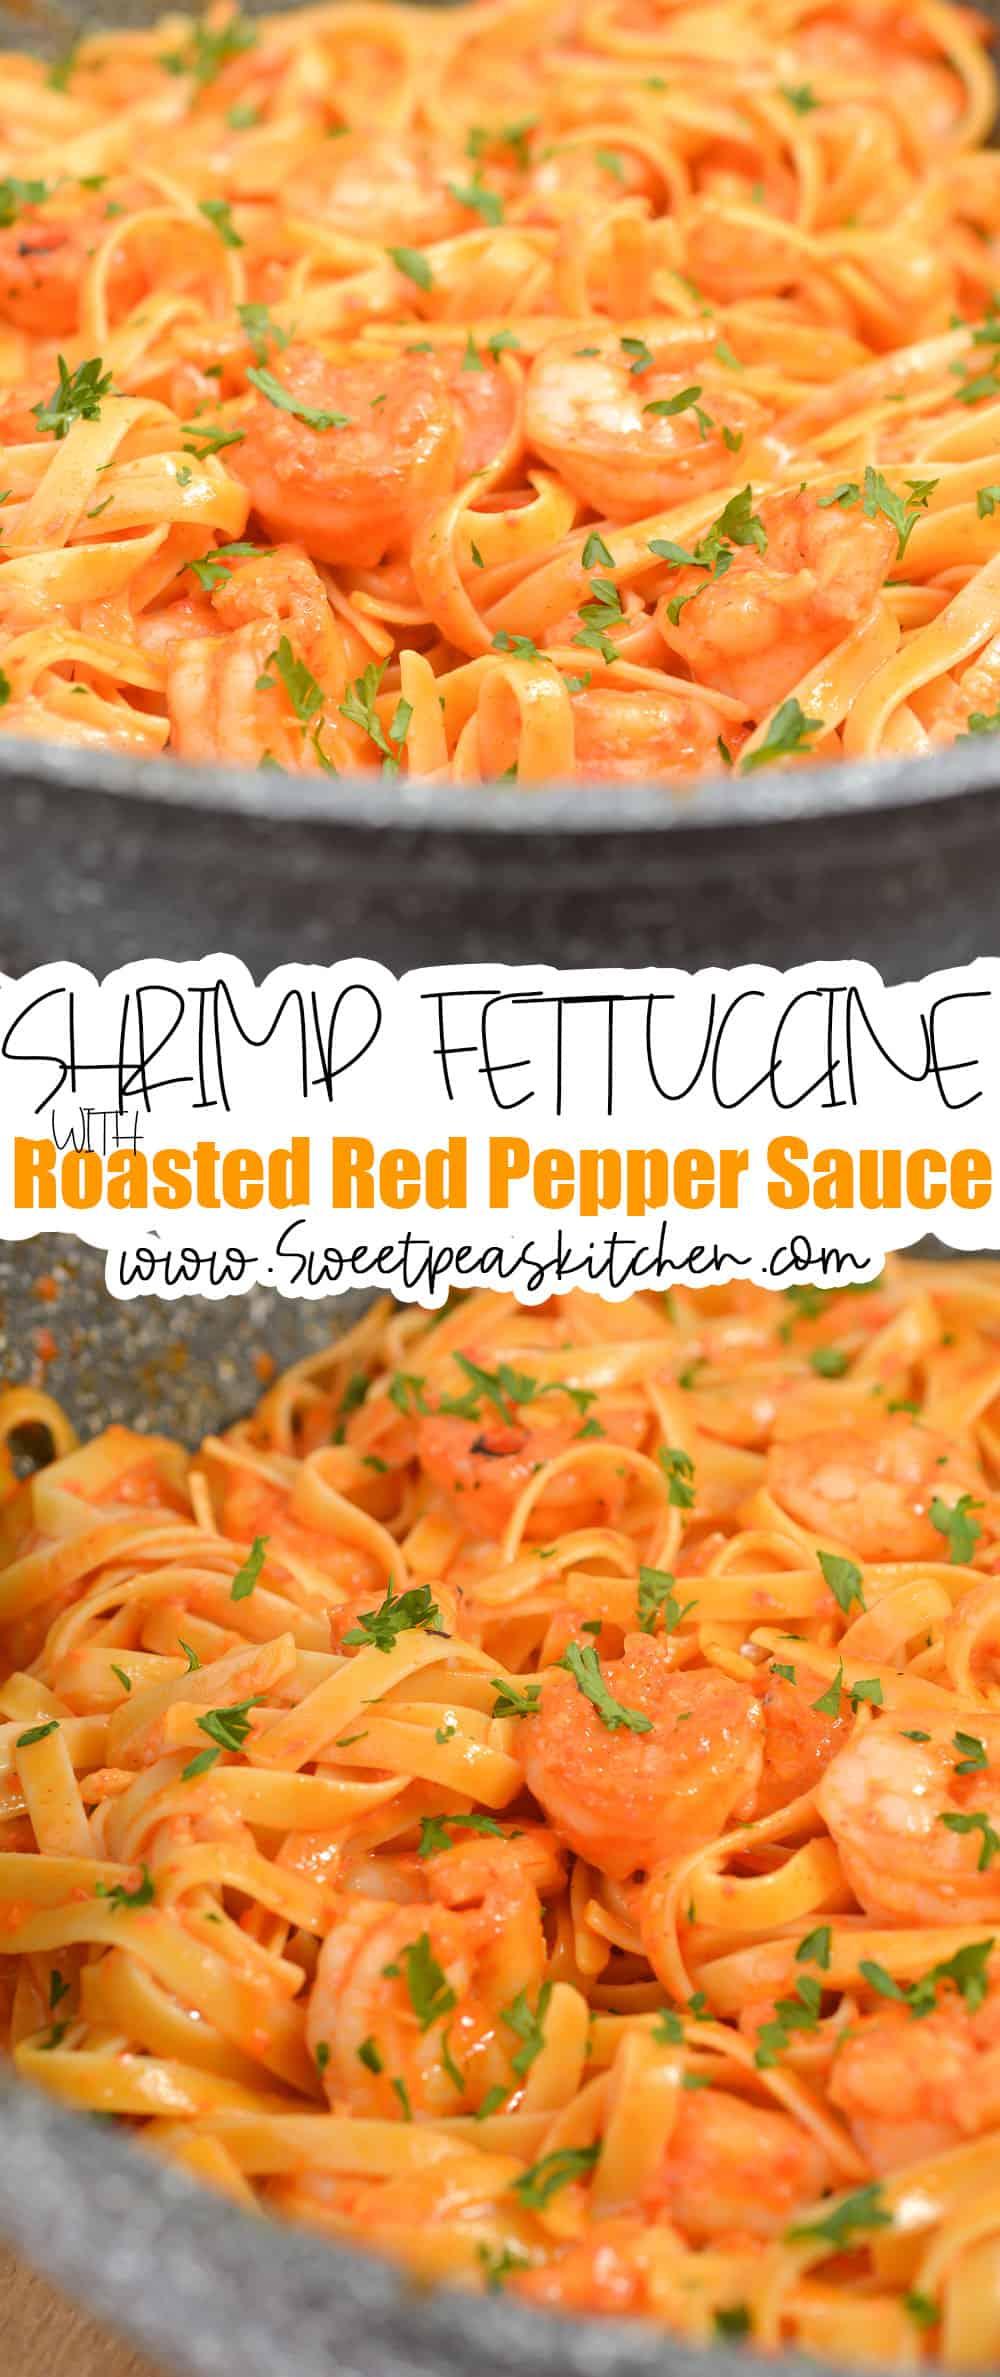 Shrimp Fettuccine with Roasted Red Pepper Sauce